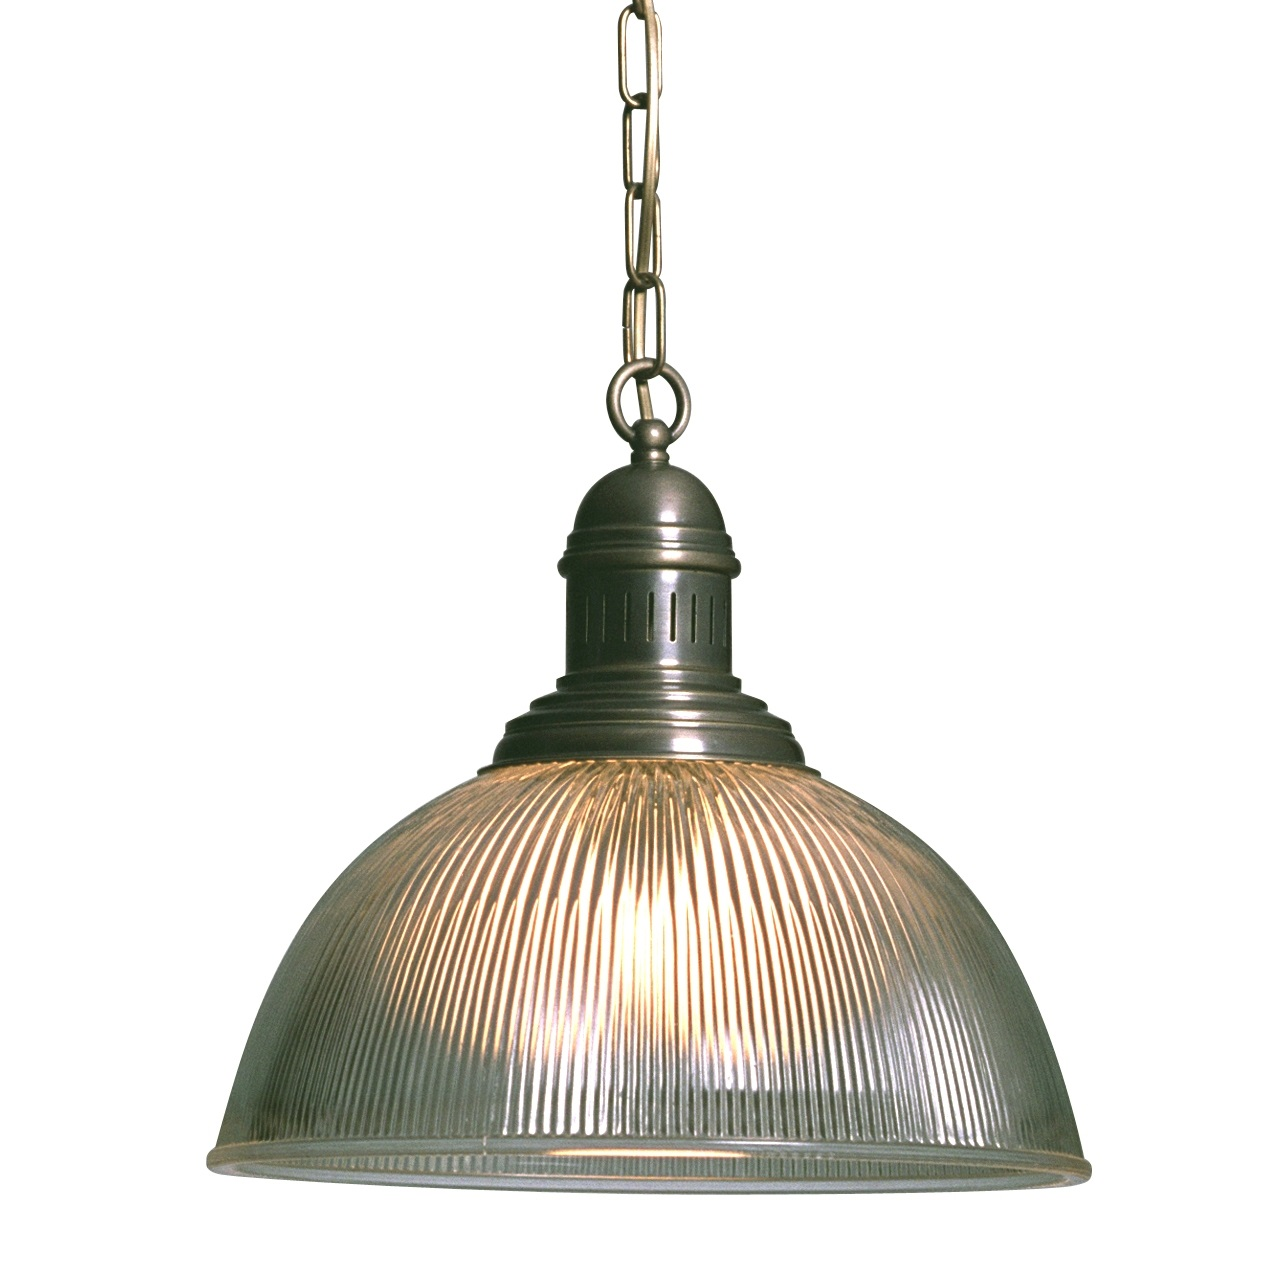 Industriele Keuken Kopen : Hanglamp Glas kopen? Online op Stoerelampen.nl